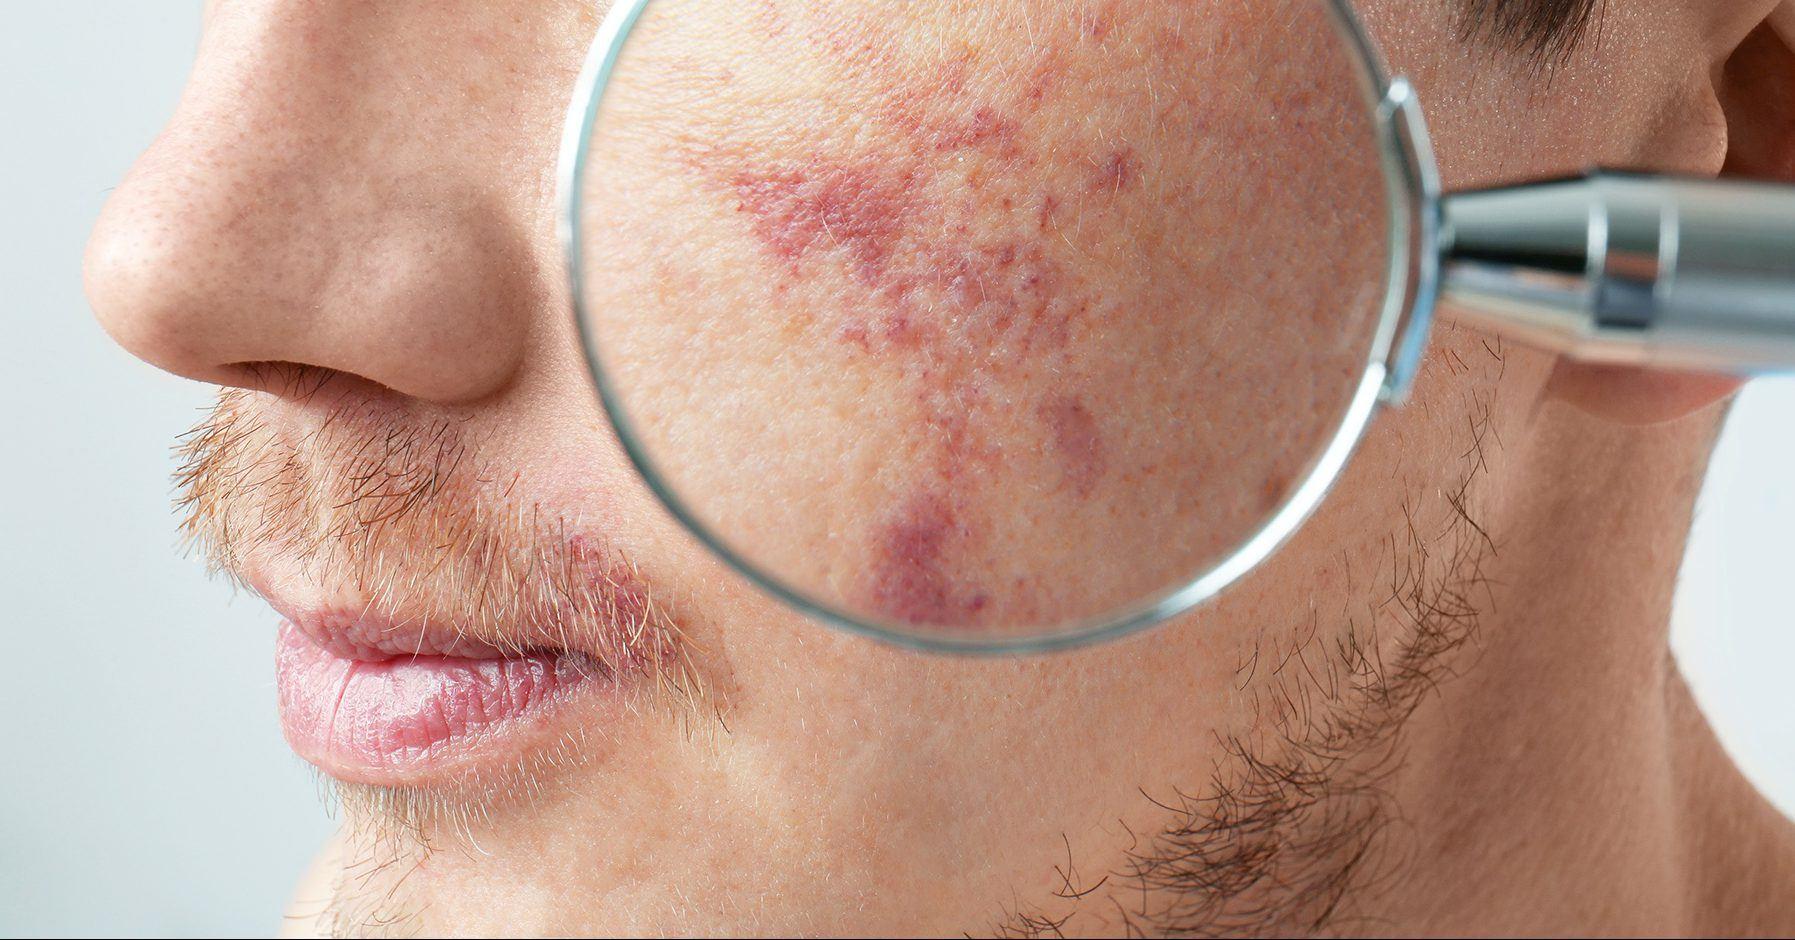 Vbeam Laser Treatment For Treating Redness Rosacea Birmingham